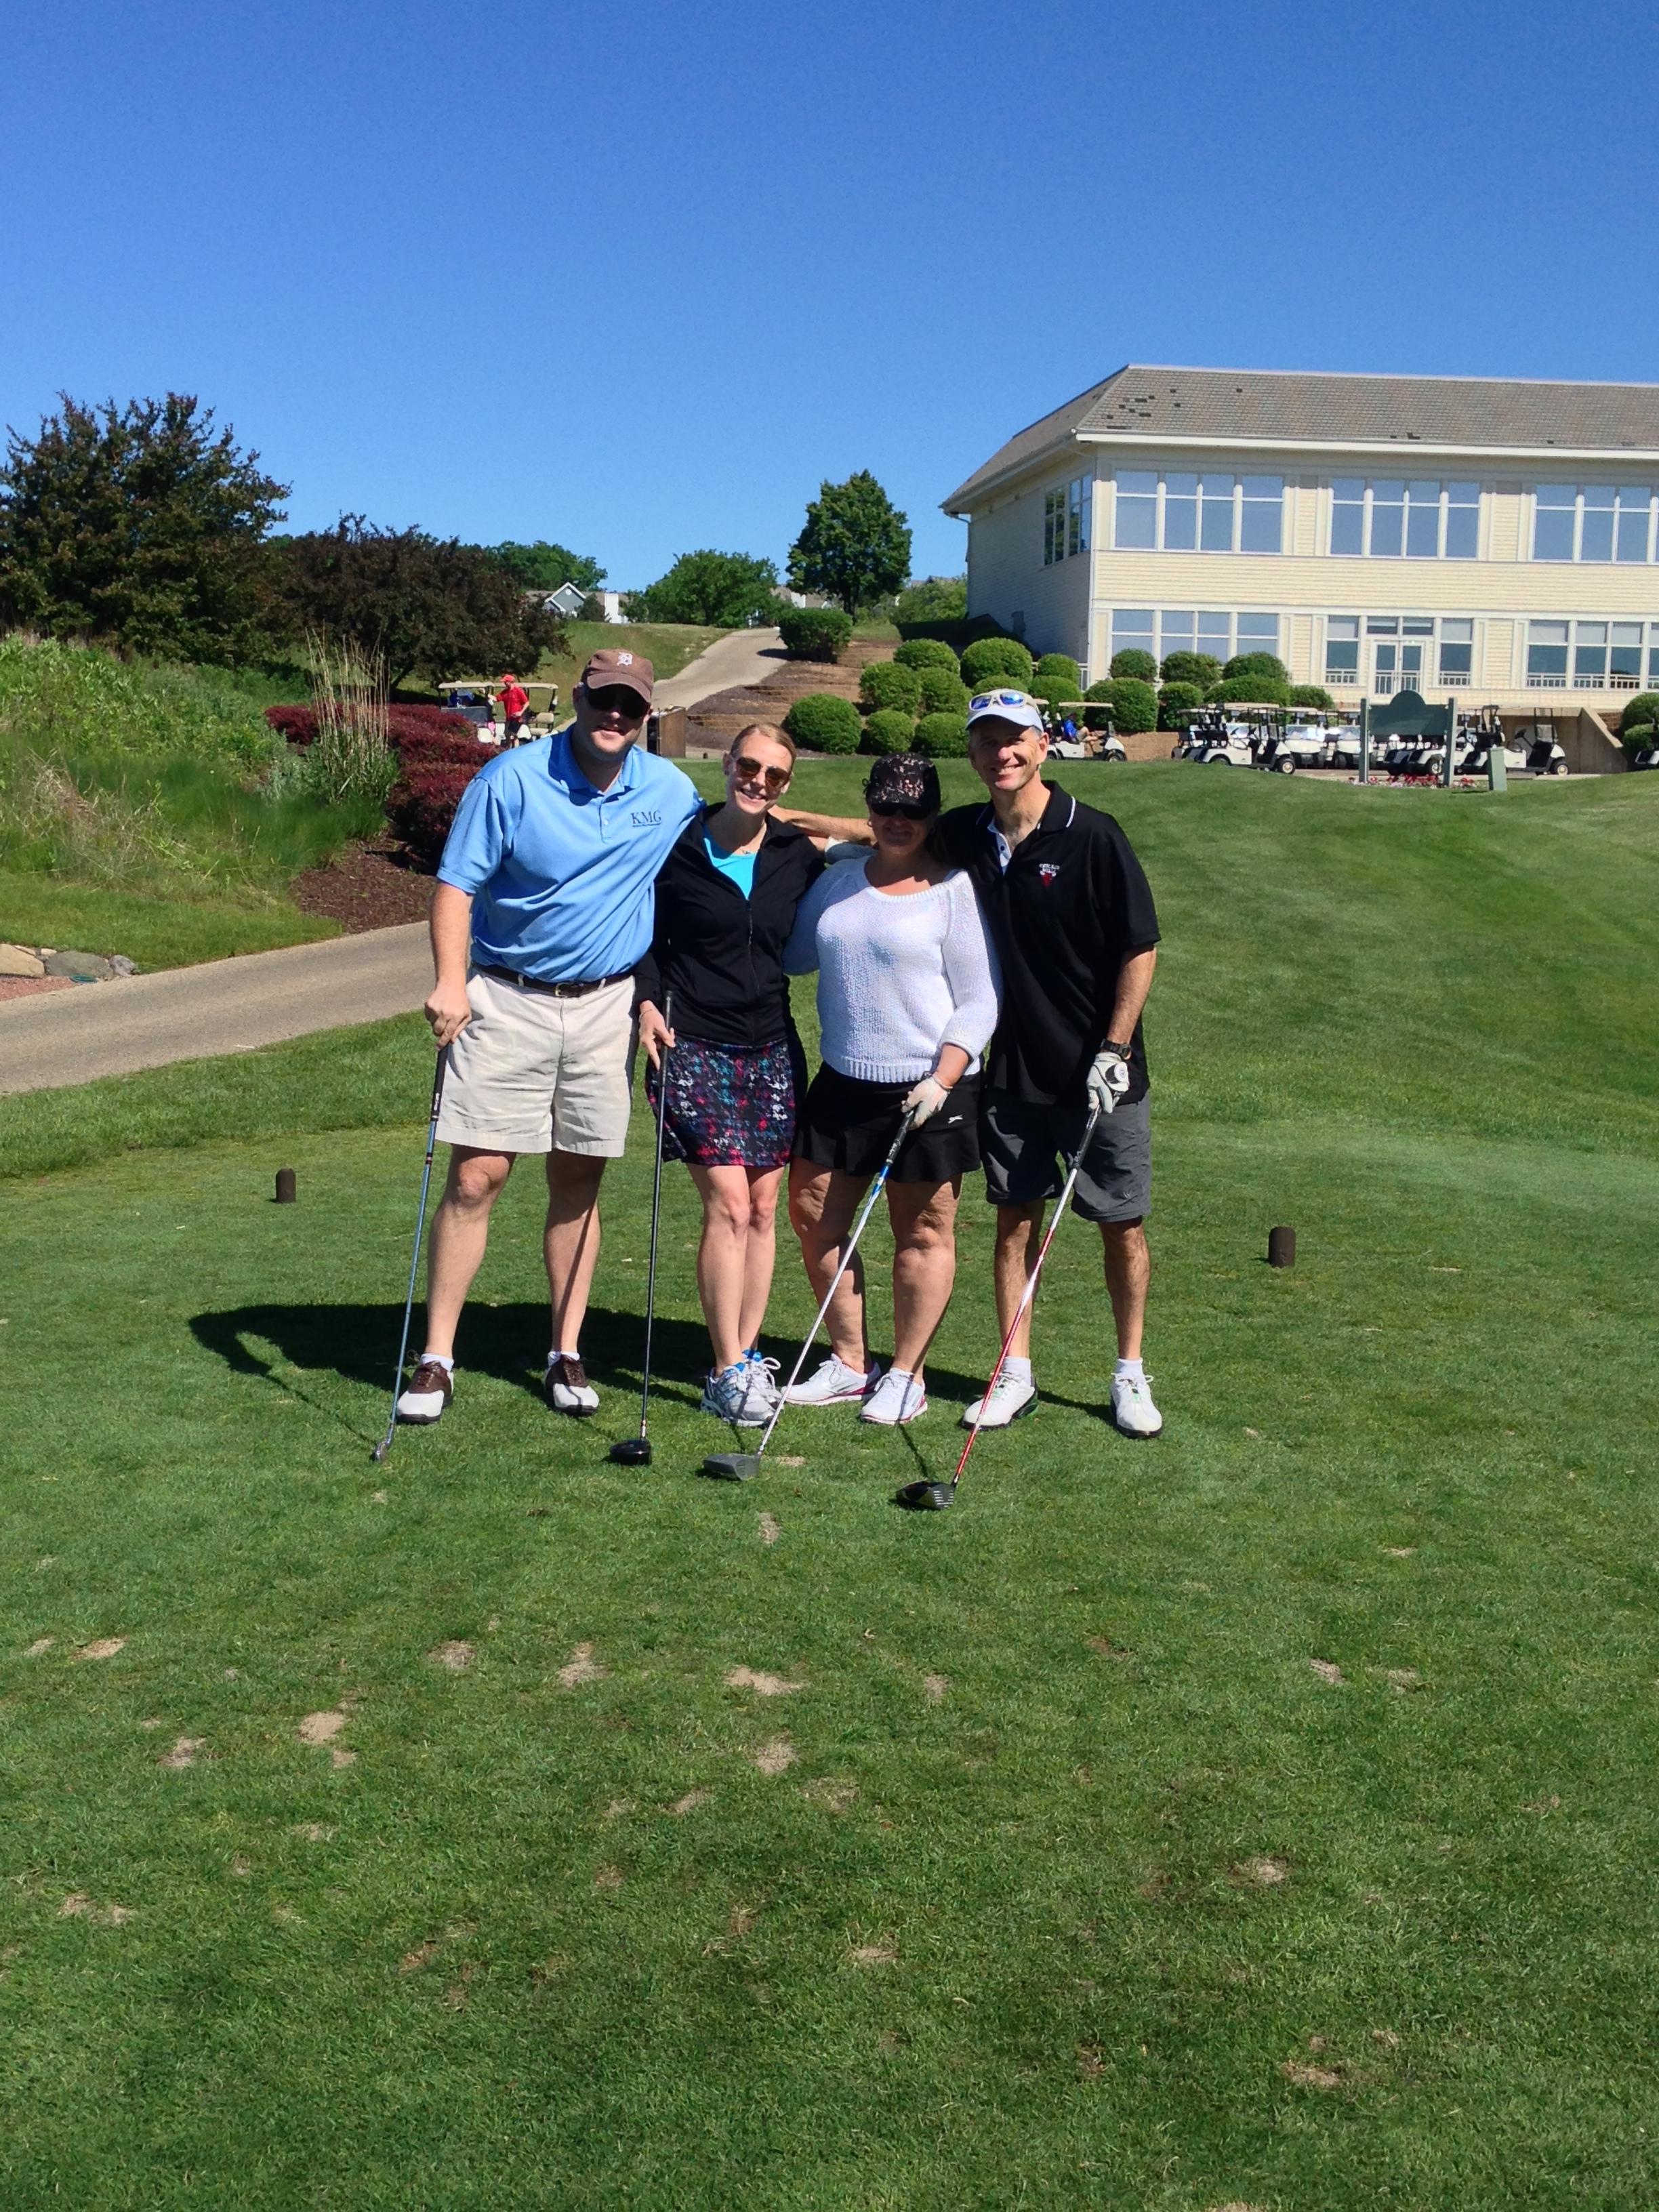 Scott McCain, Kristin Thomas, Jill Baker and Terry Donohue